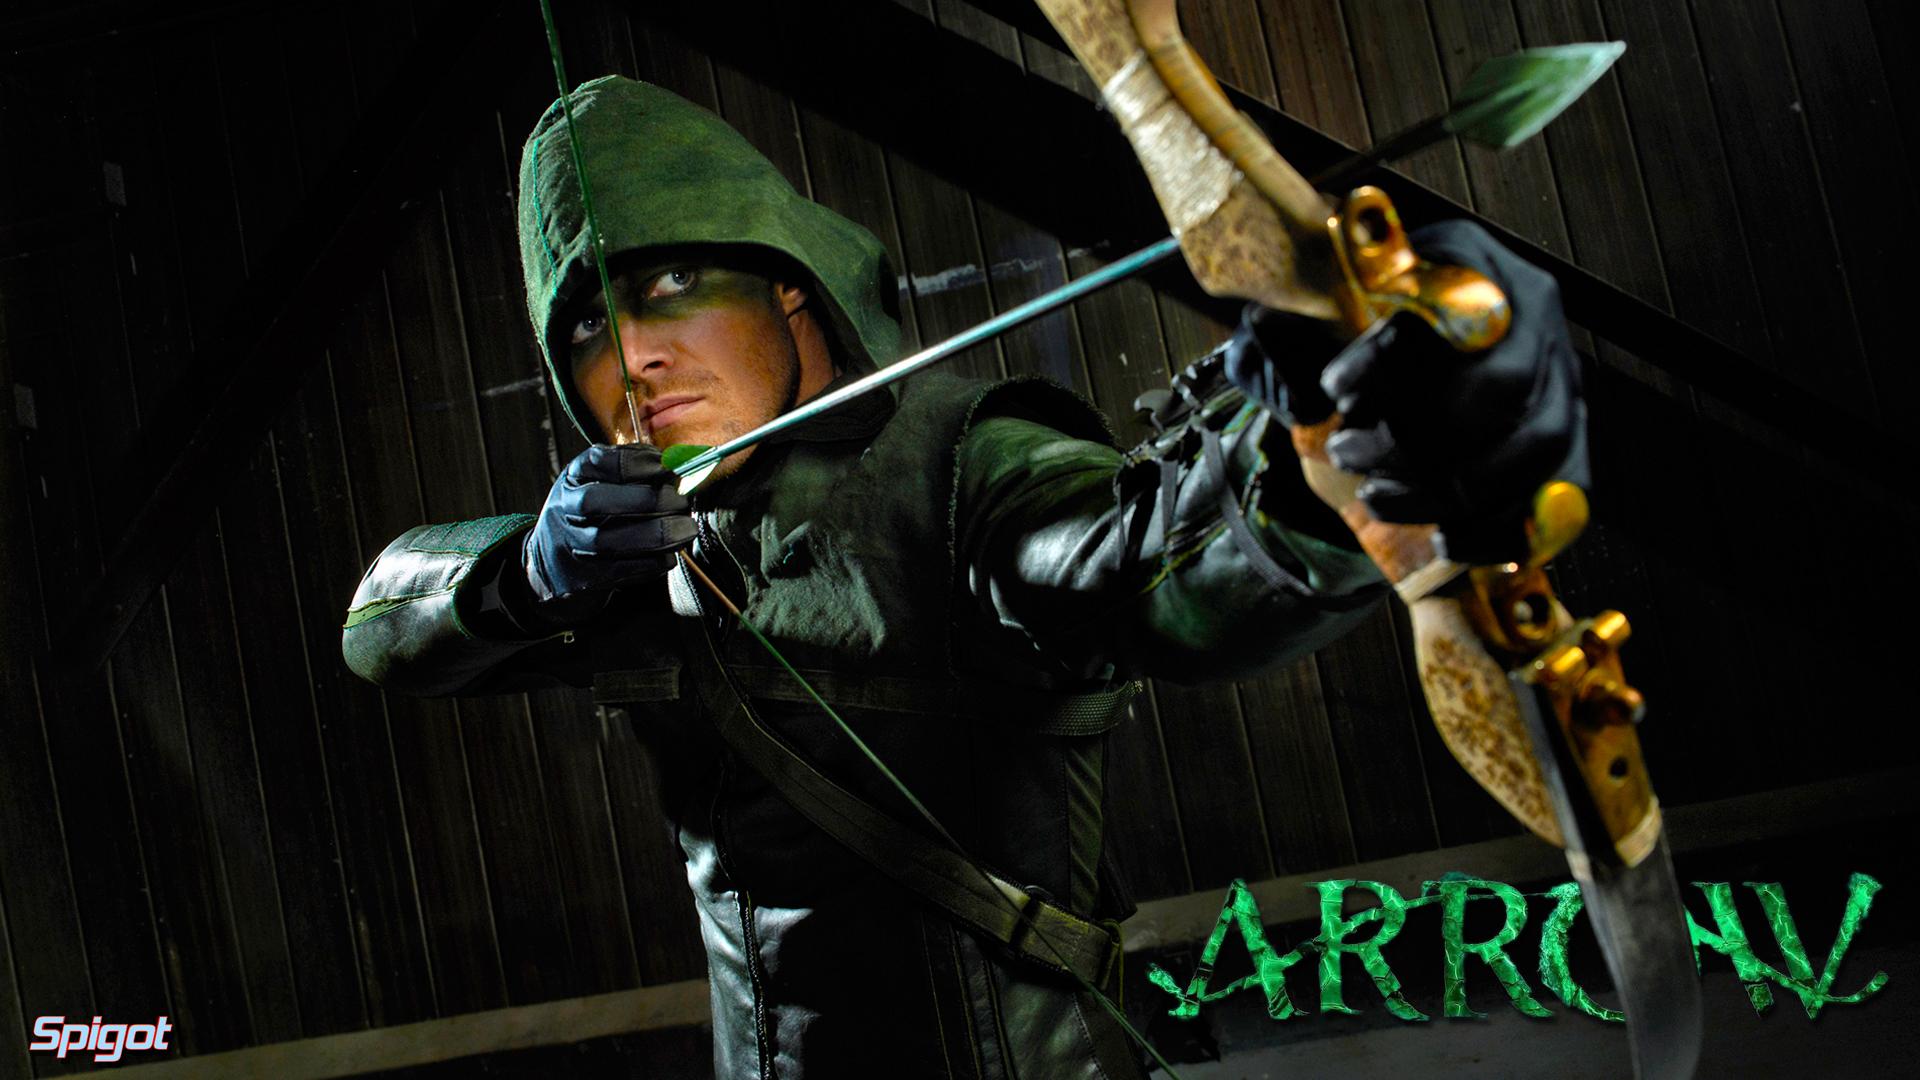 Arrow Tv Series wallpaper   843315 1920x1080